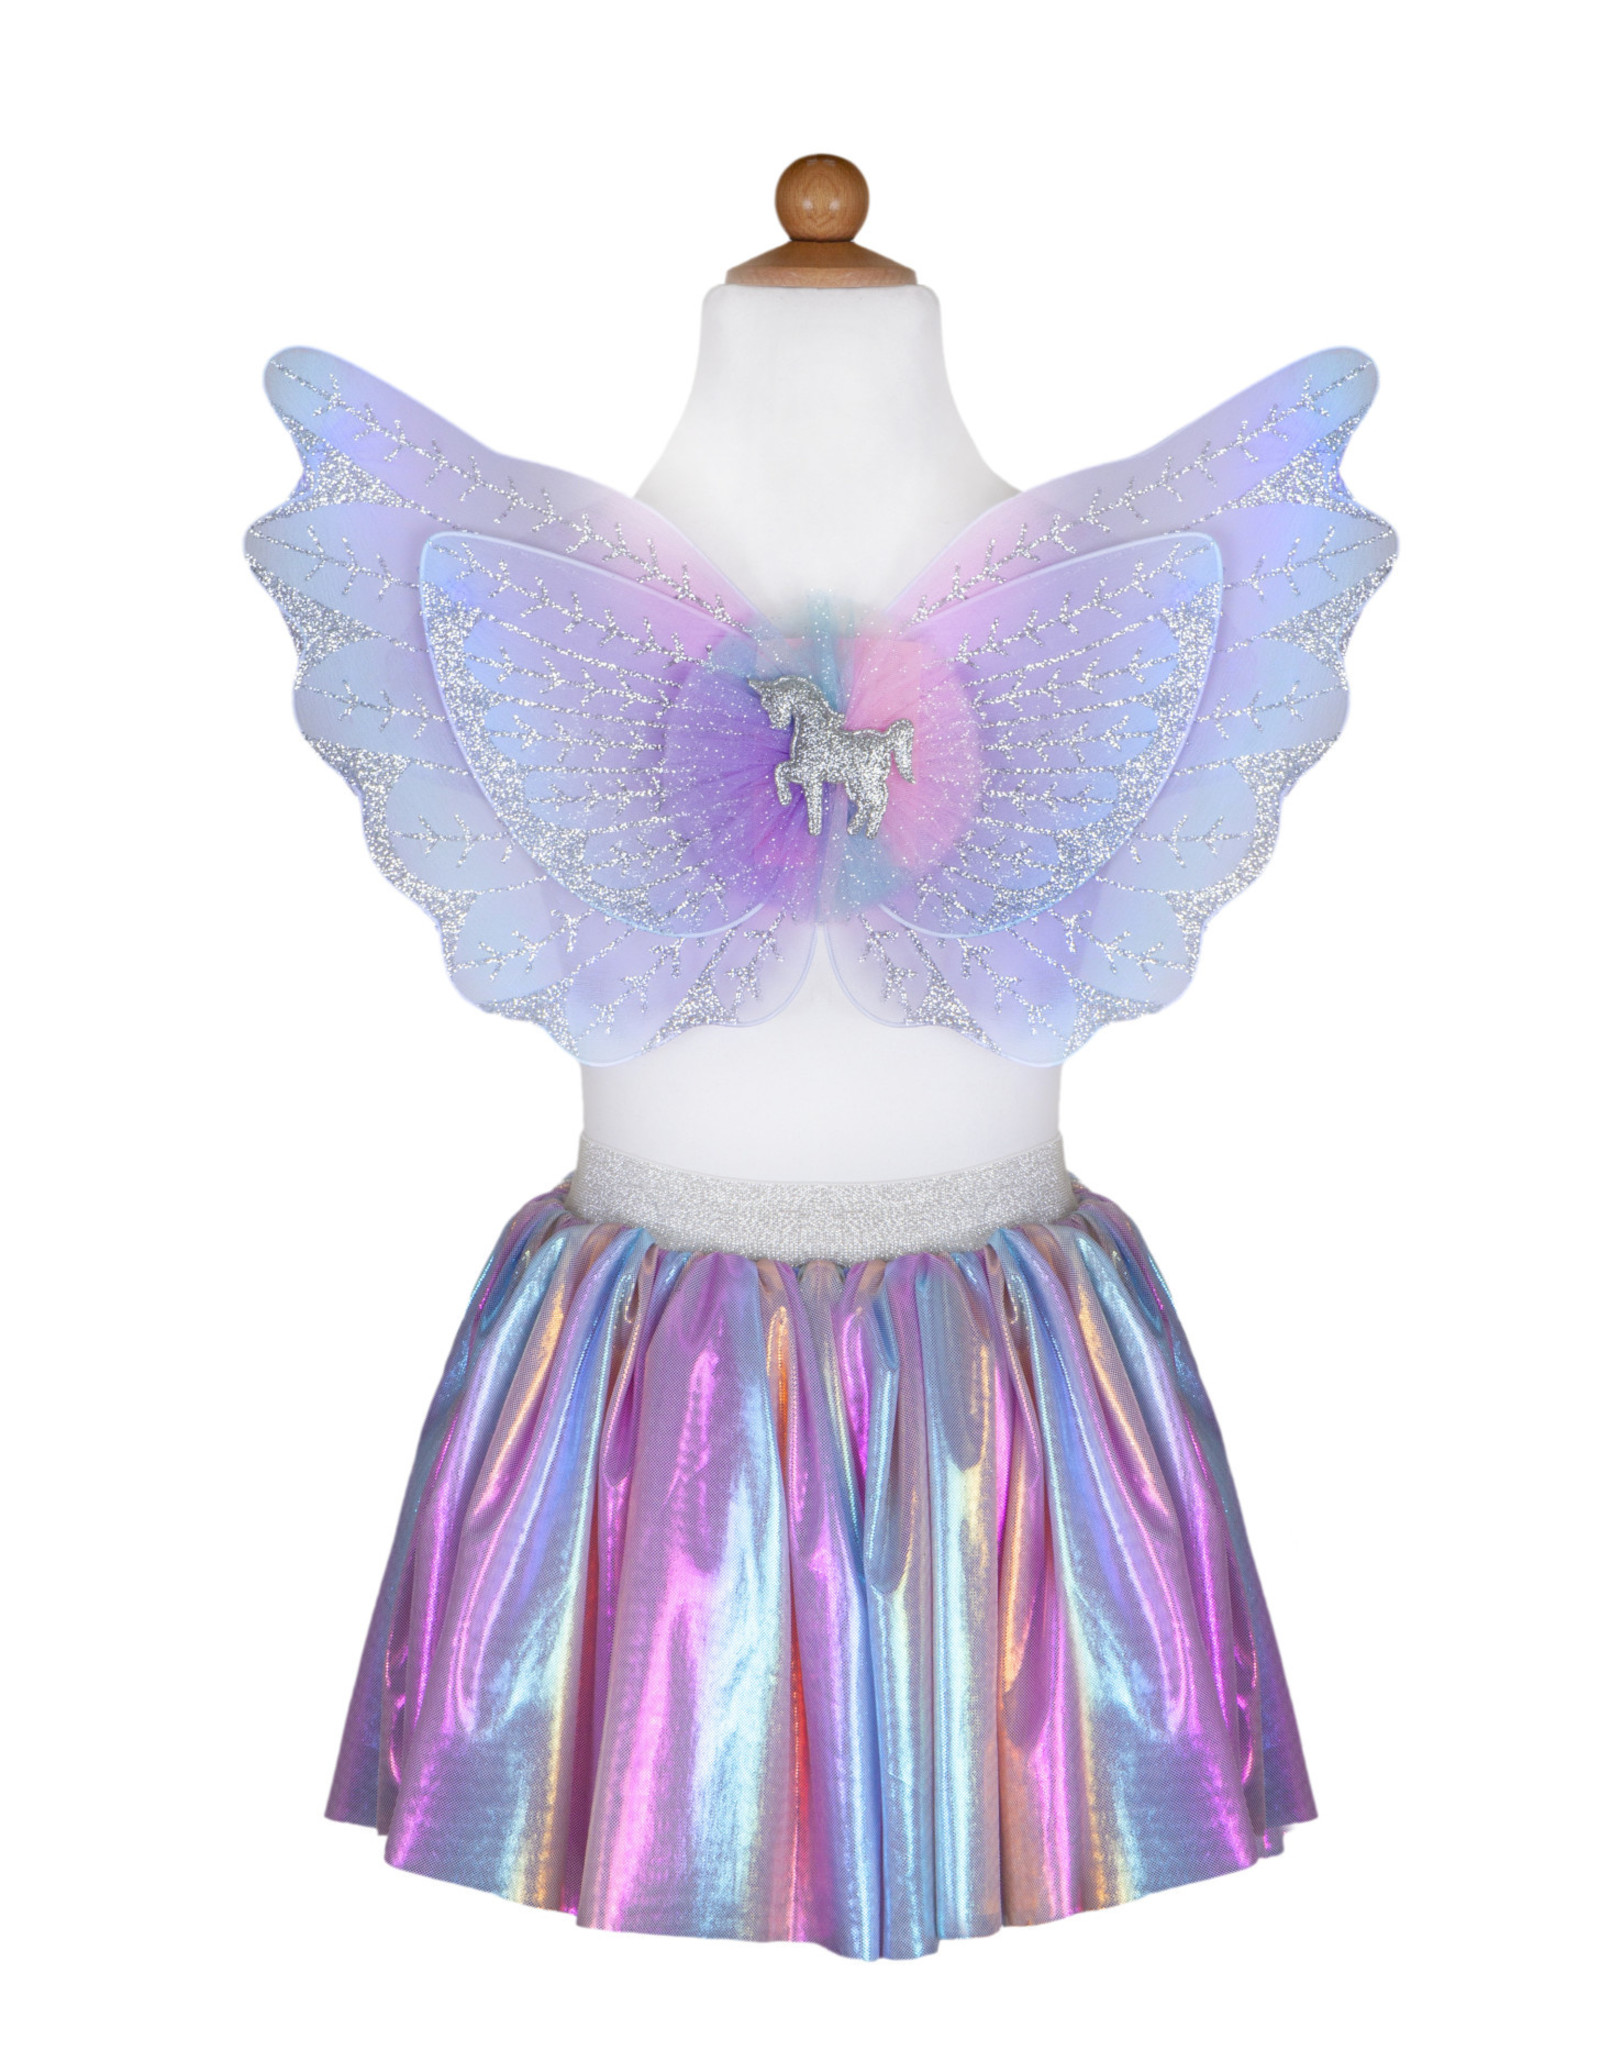 Great Pretenders Magical Unicorn Skirt & Wings